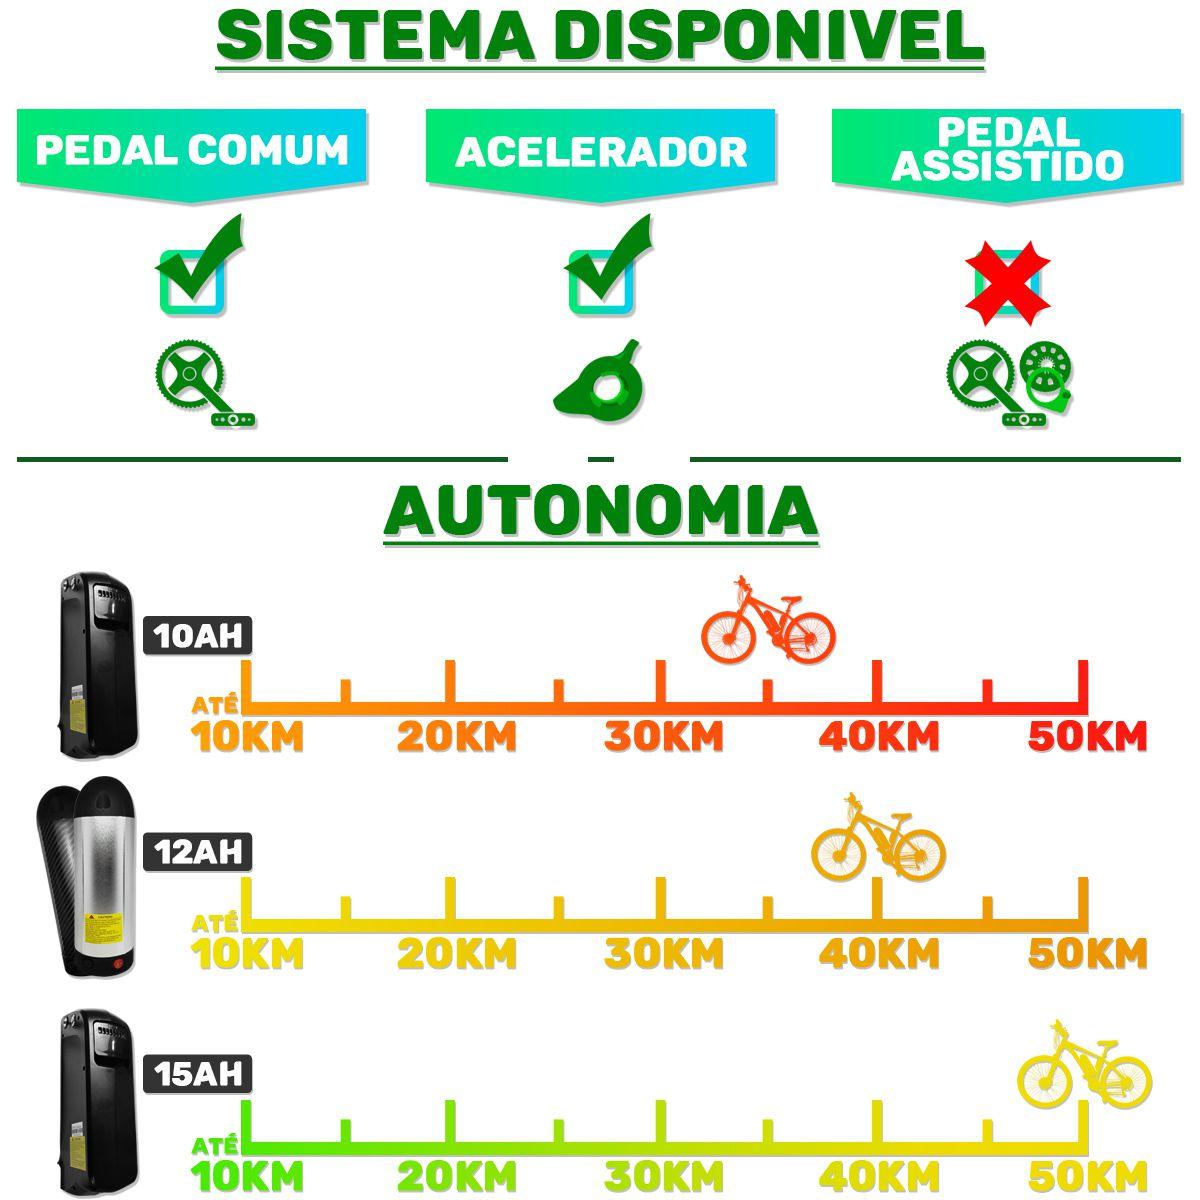 Bicicleta Elétrica Aro 26 Bateria de Litio TecStilo